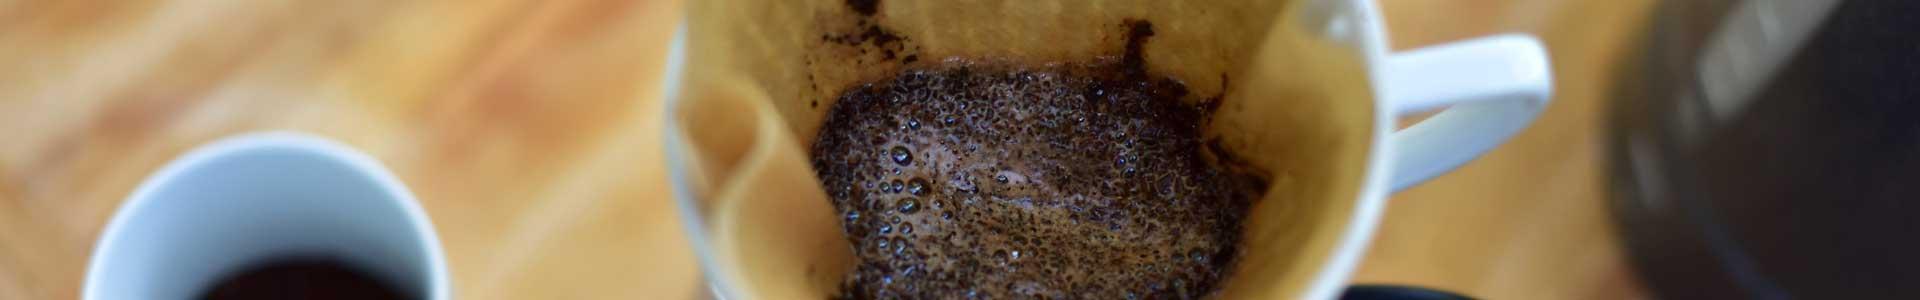 Kaffee-Kategorie